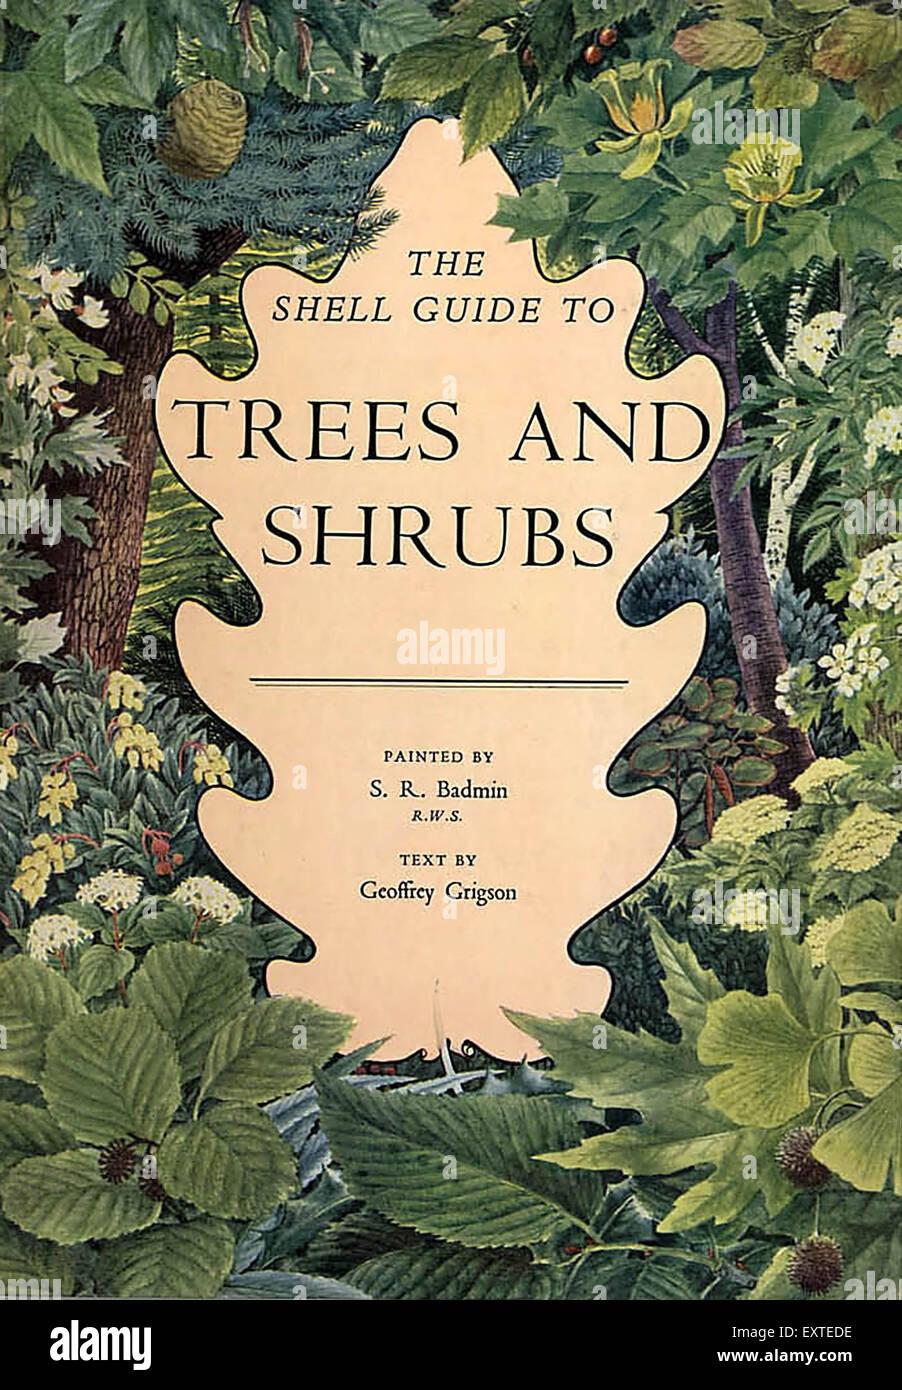 1950er Jahre UK Shell Leitfaden für Bäume und Sträucher Buchcover Stockbild